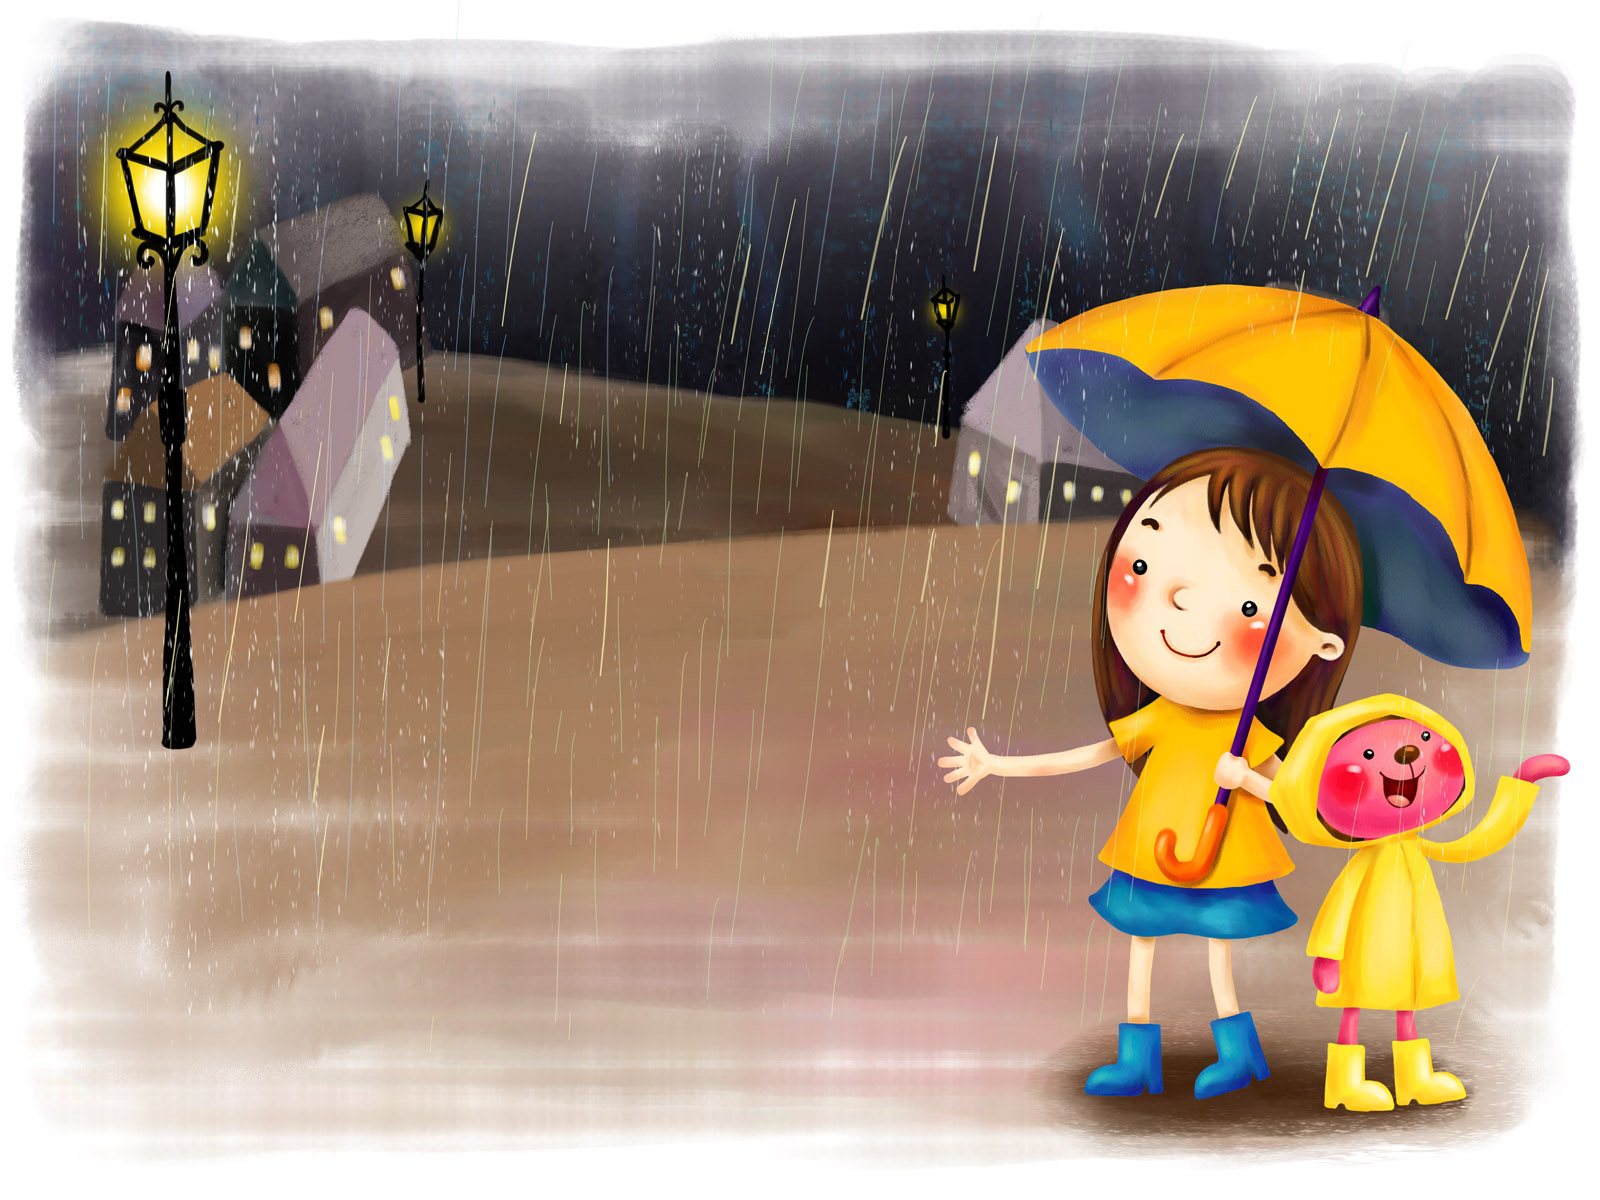 Cute Wallpaper Images For Dp Rainy Wallpapers Desktop Wallpapers